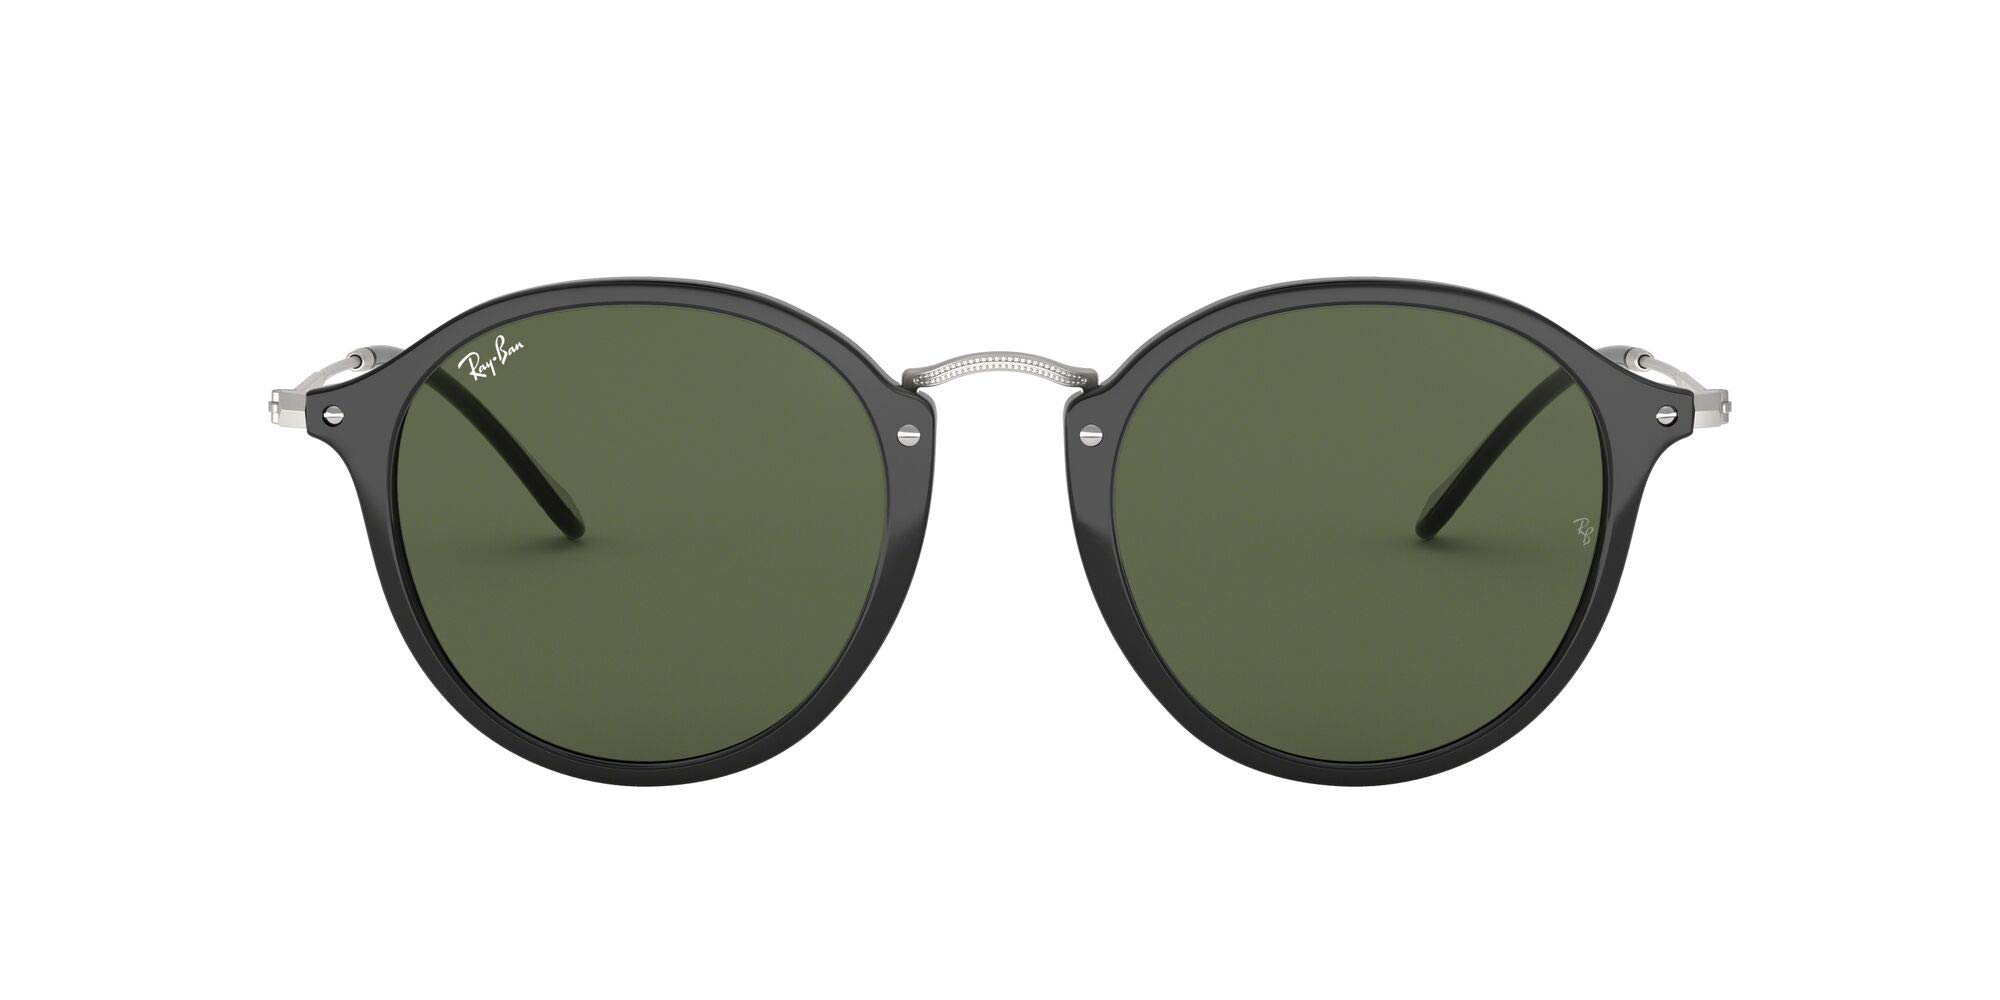 Ray-Ban Rb2447 Round Fleck Sunglasses